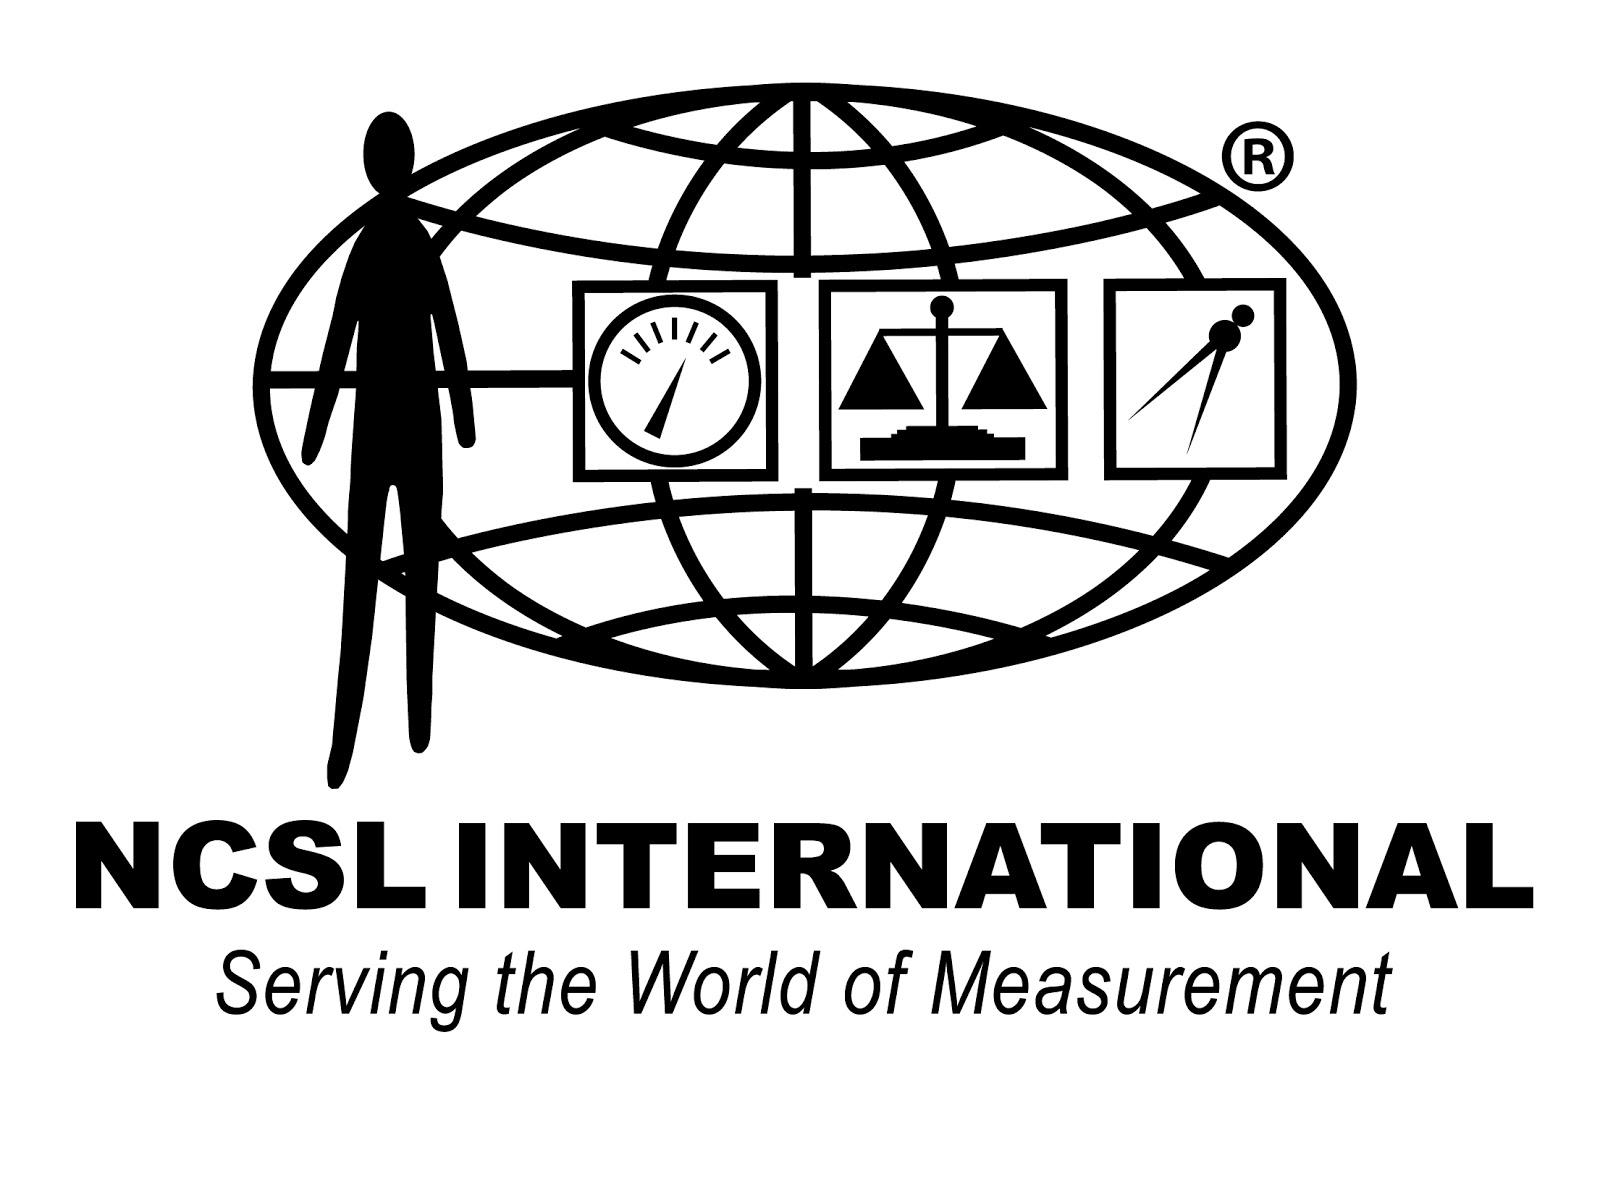 NCSL International Workshop & Symposium, Saint Paul